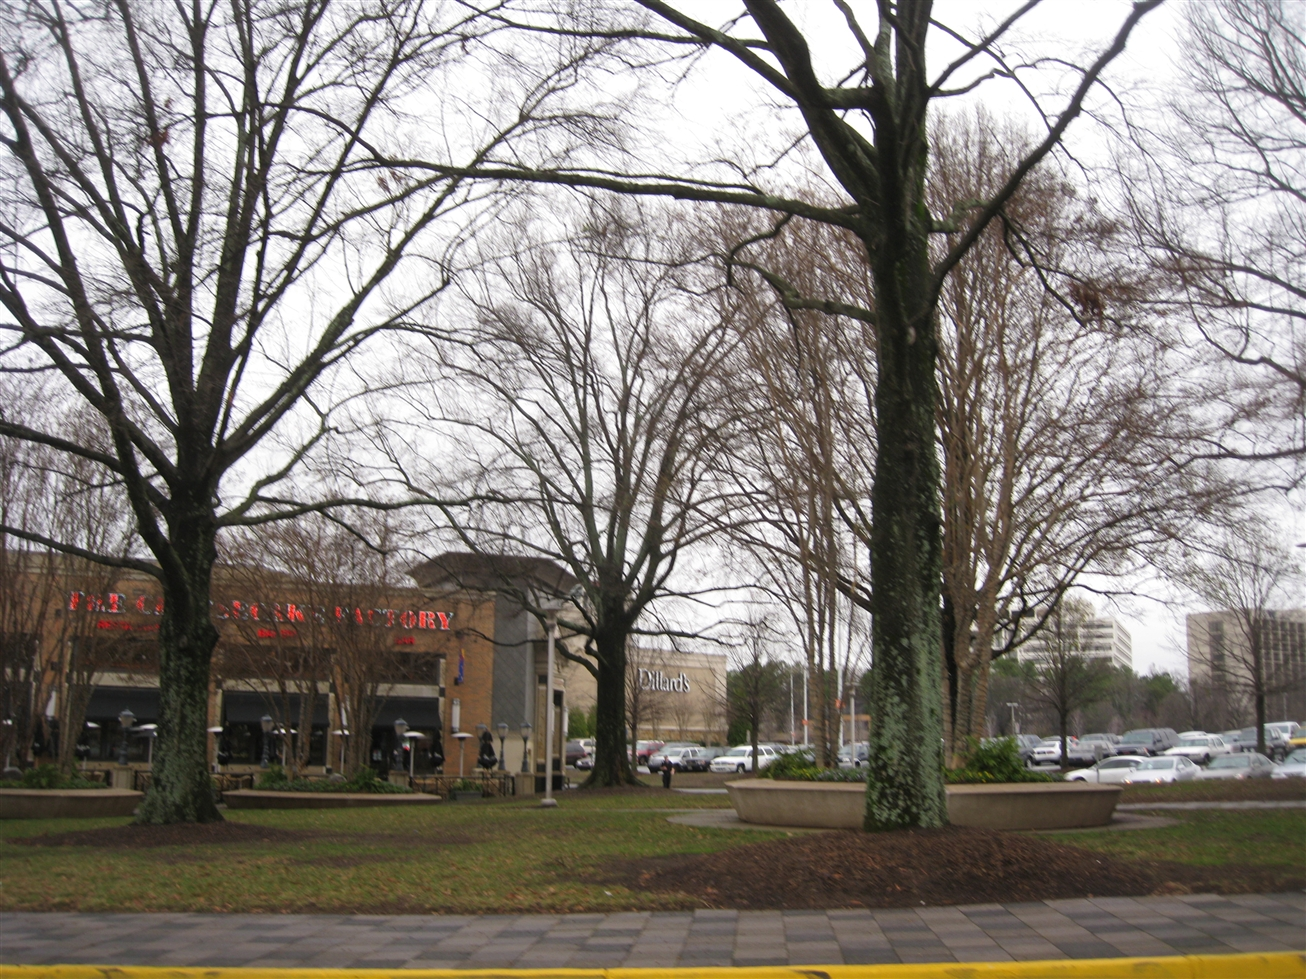 Labelscar: The Retail History BlogPerimeter Mall; Dunwoody